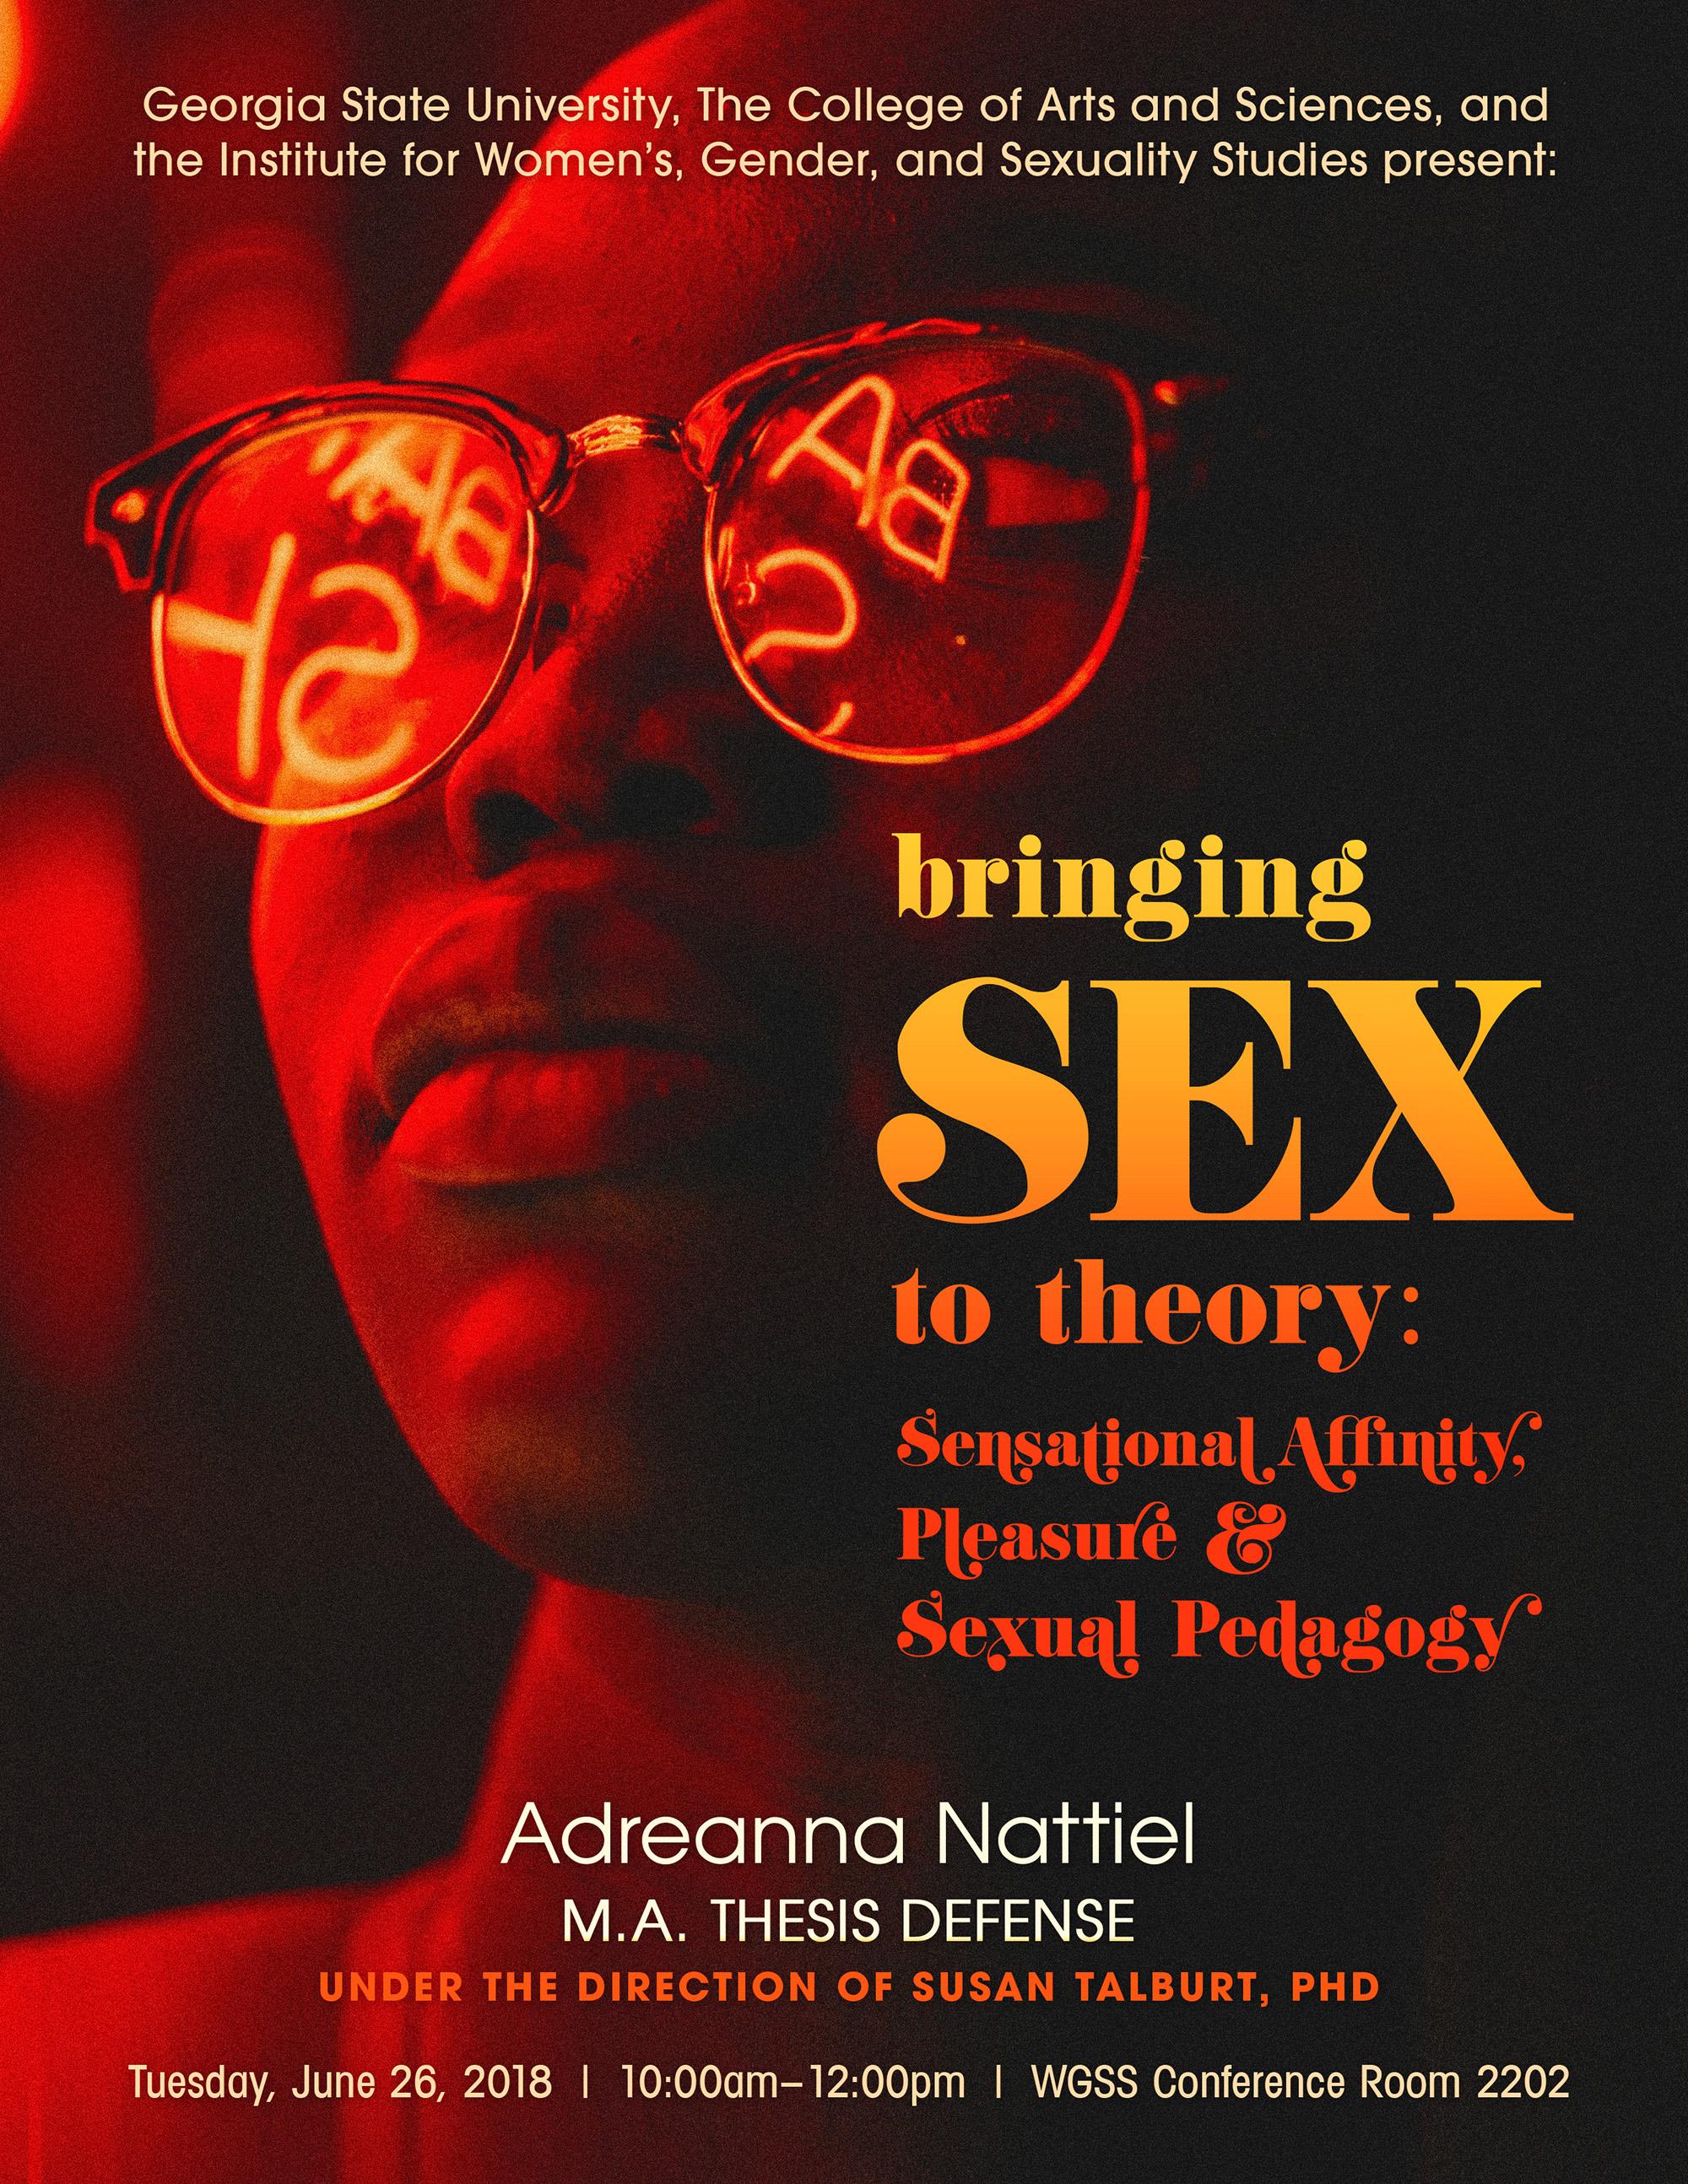 adreanna's thesis defense flyer_large.jpg